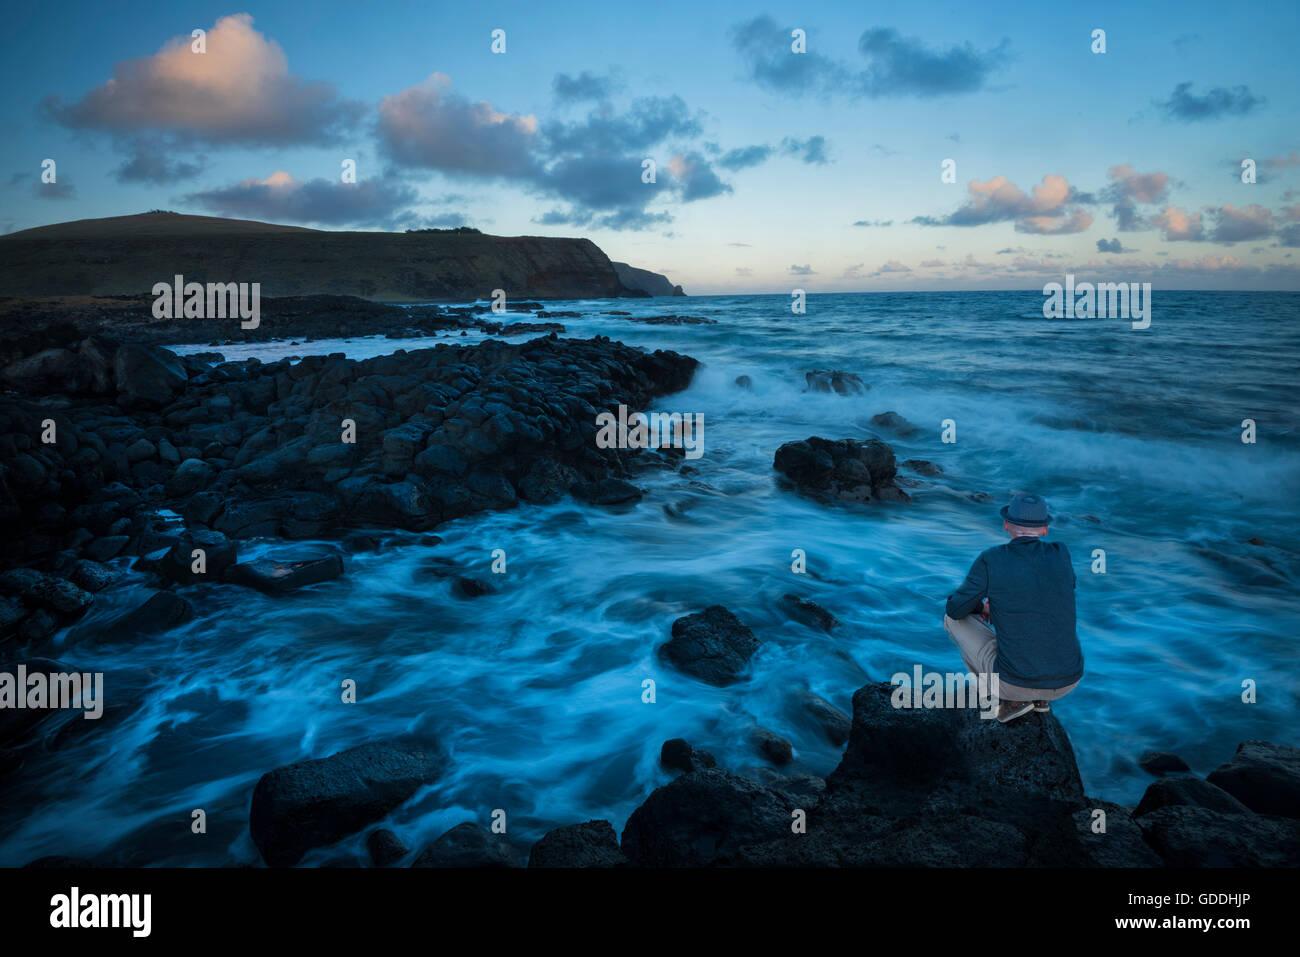 South America,Chile,Easter Island,Isla de Pasqua,south pacific,UNESCO,World Heritage,(m) - Stock Image